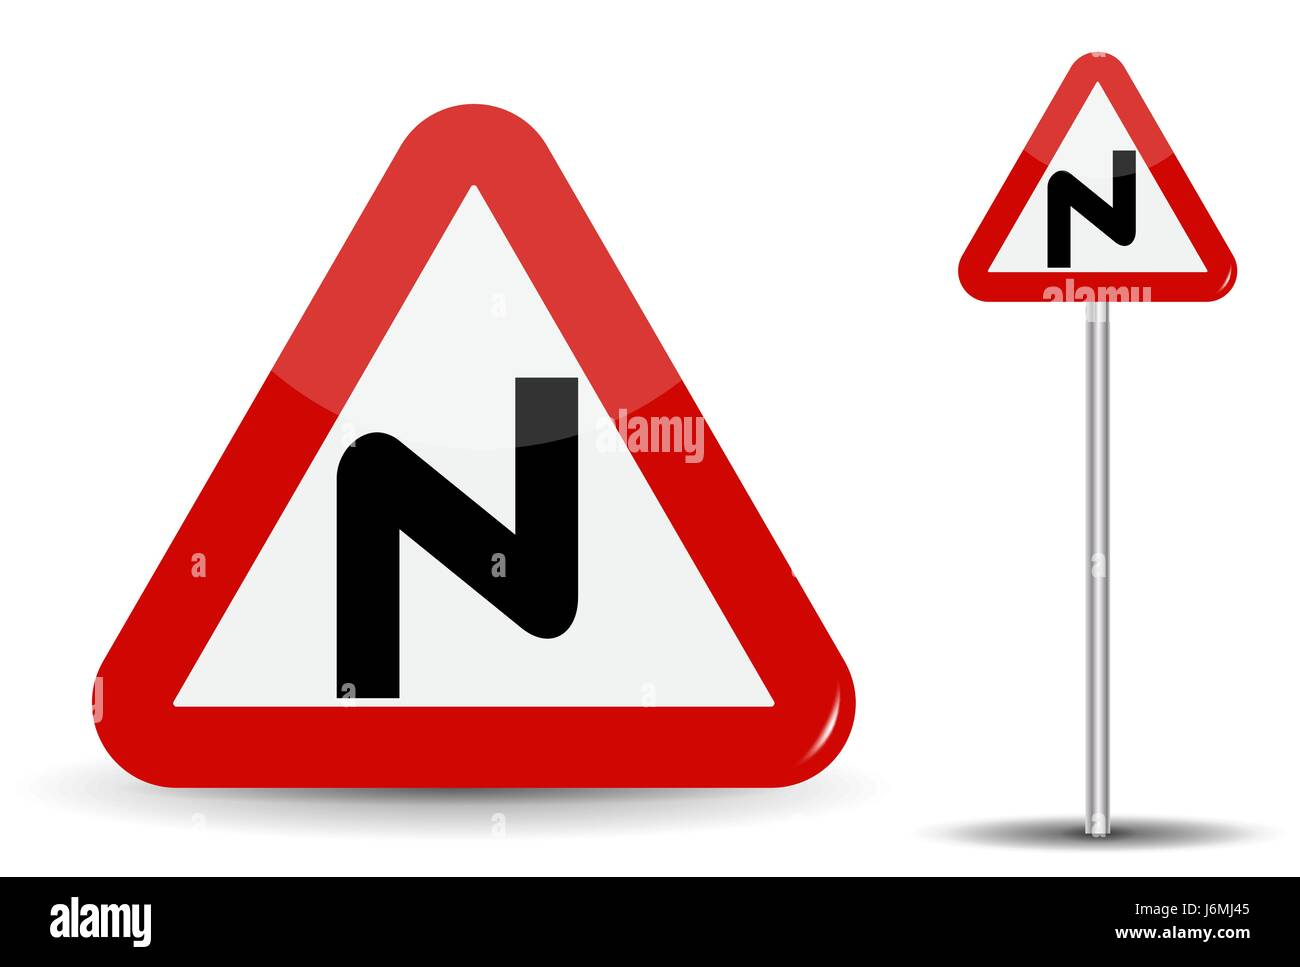 Warning To Drive Carefully Stockfotos & Warning To Drive Carefully ...